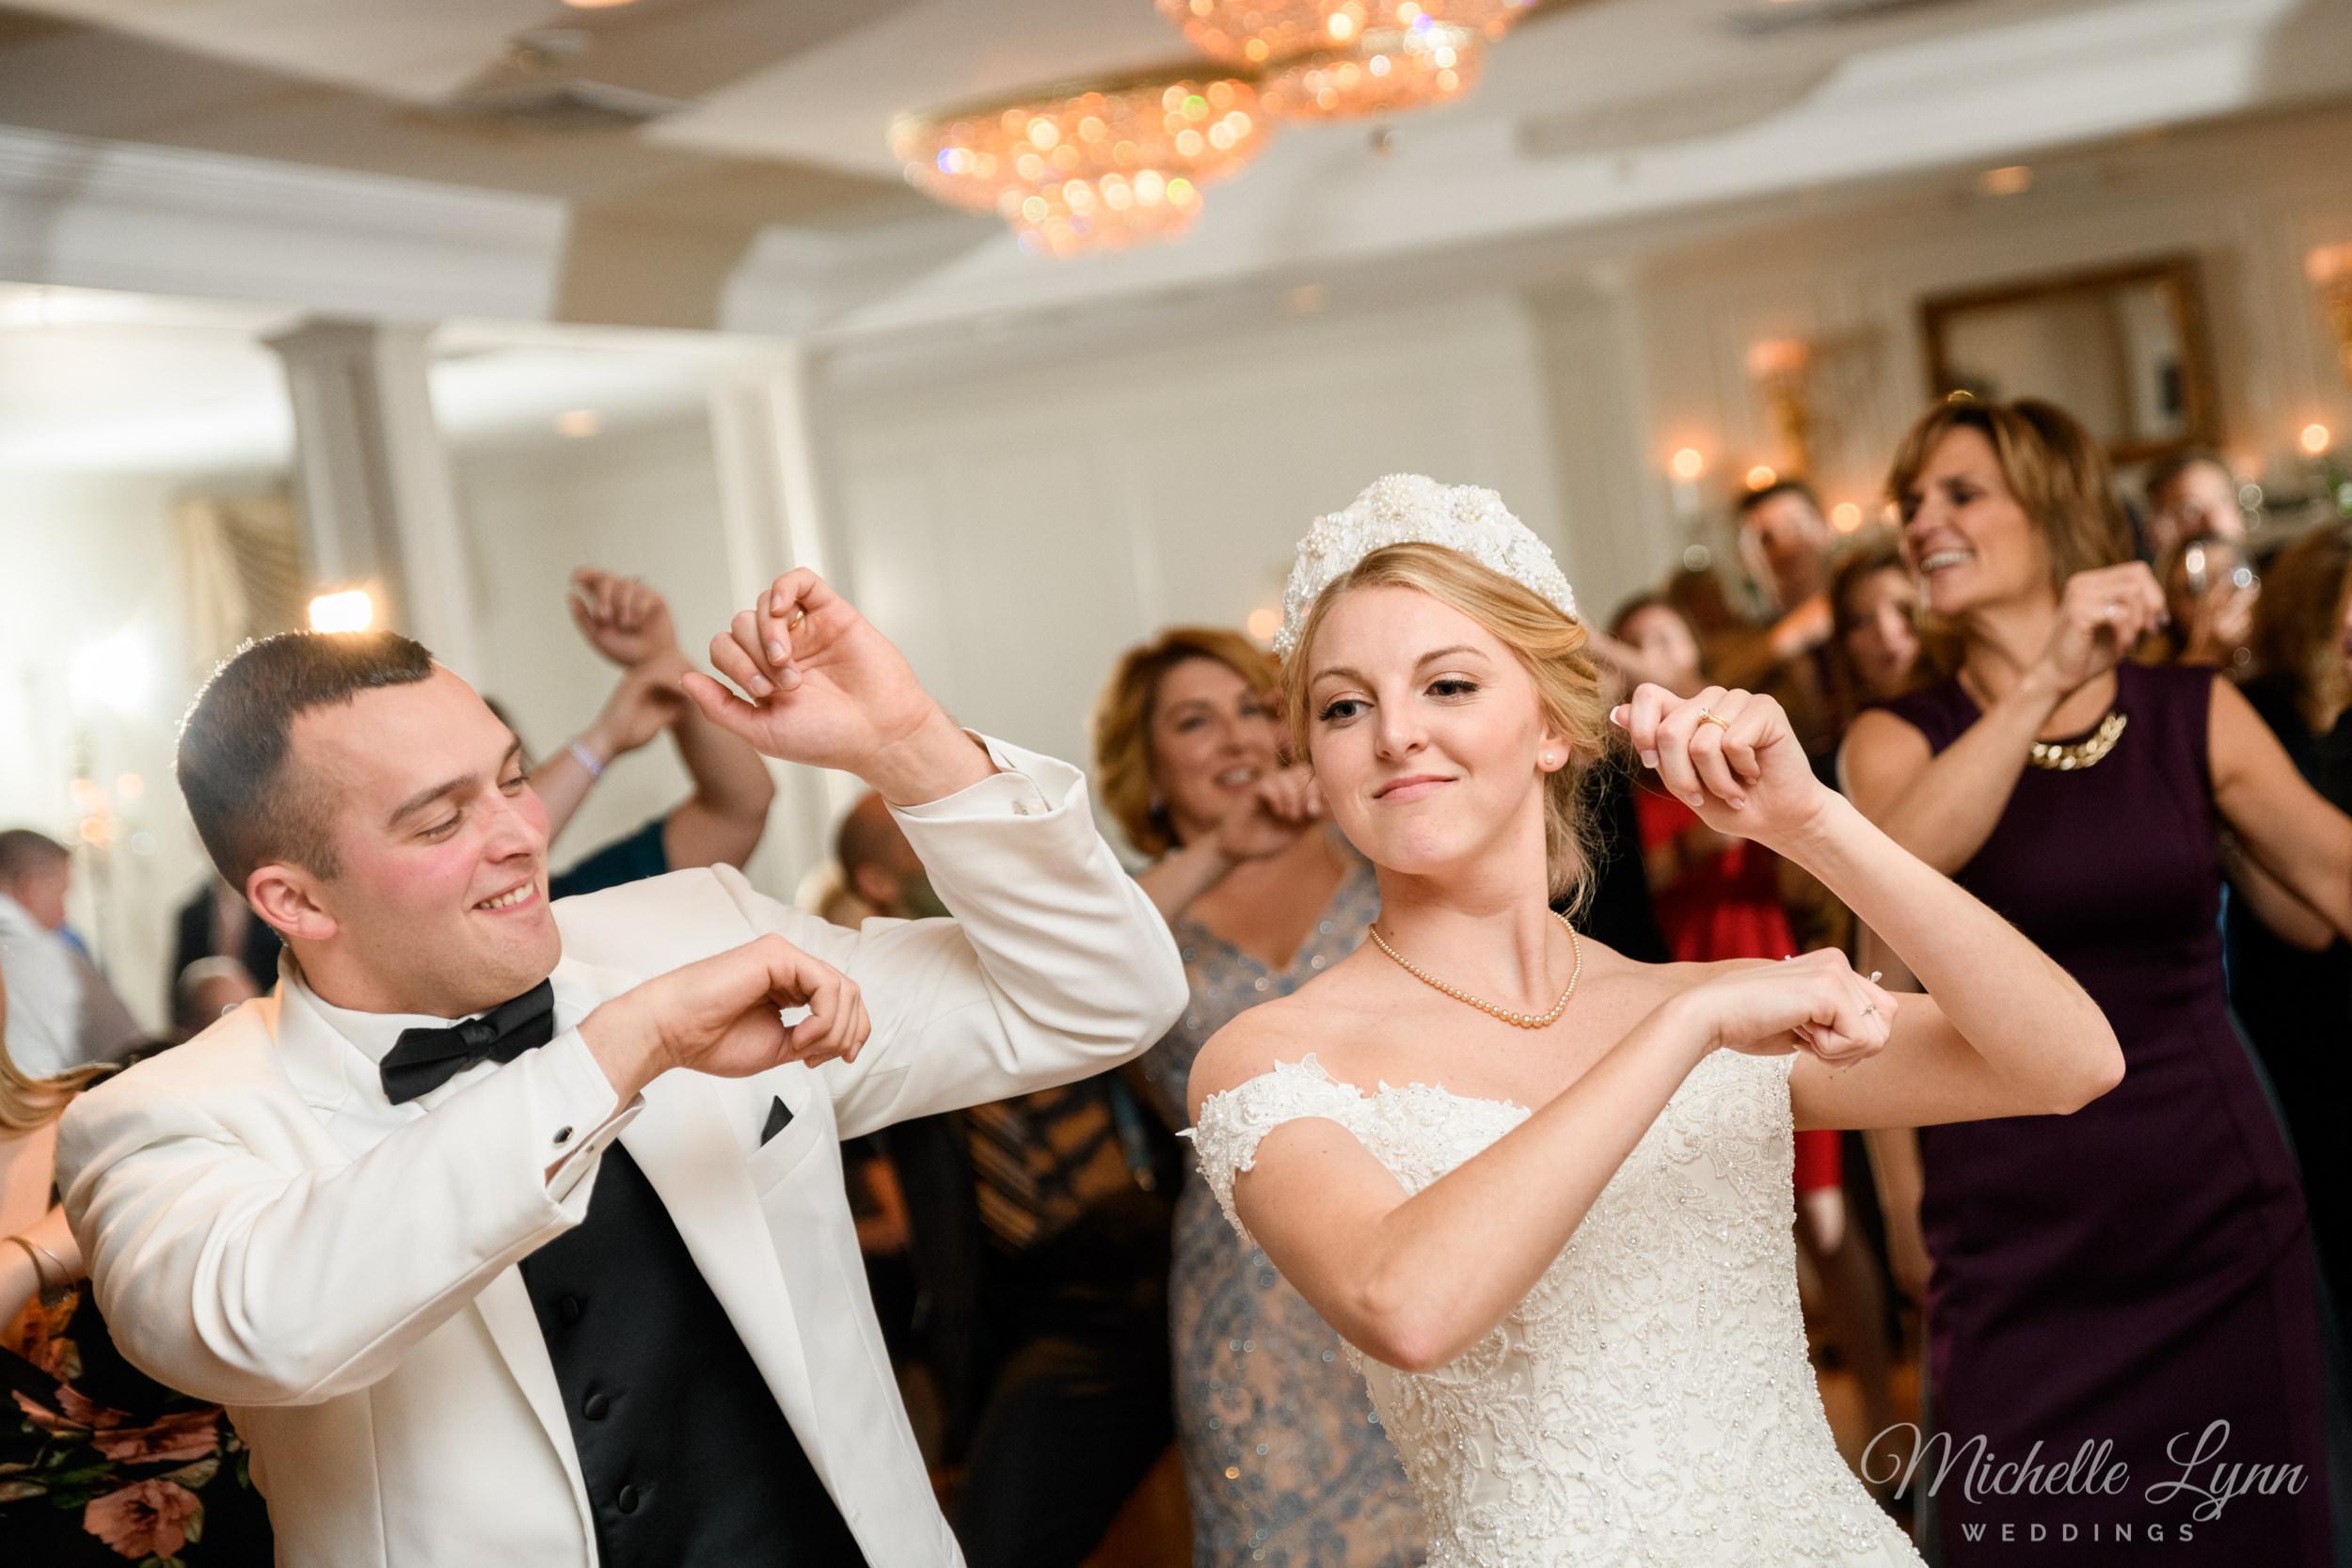 william-penn-inn-wedding-photography-mlw-104.jpg